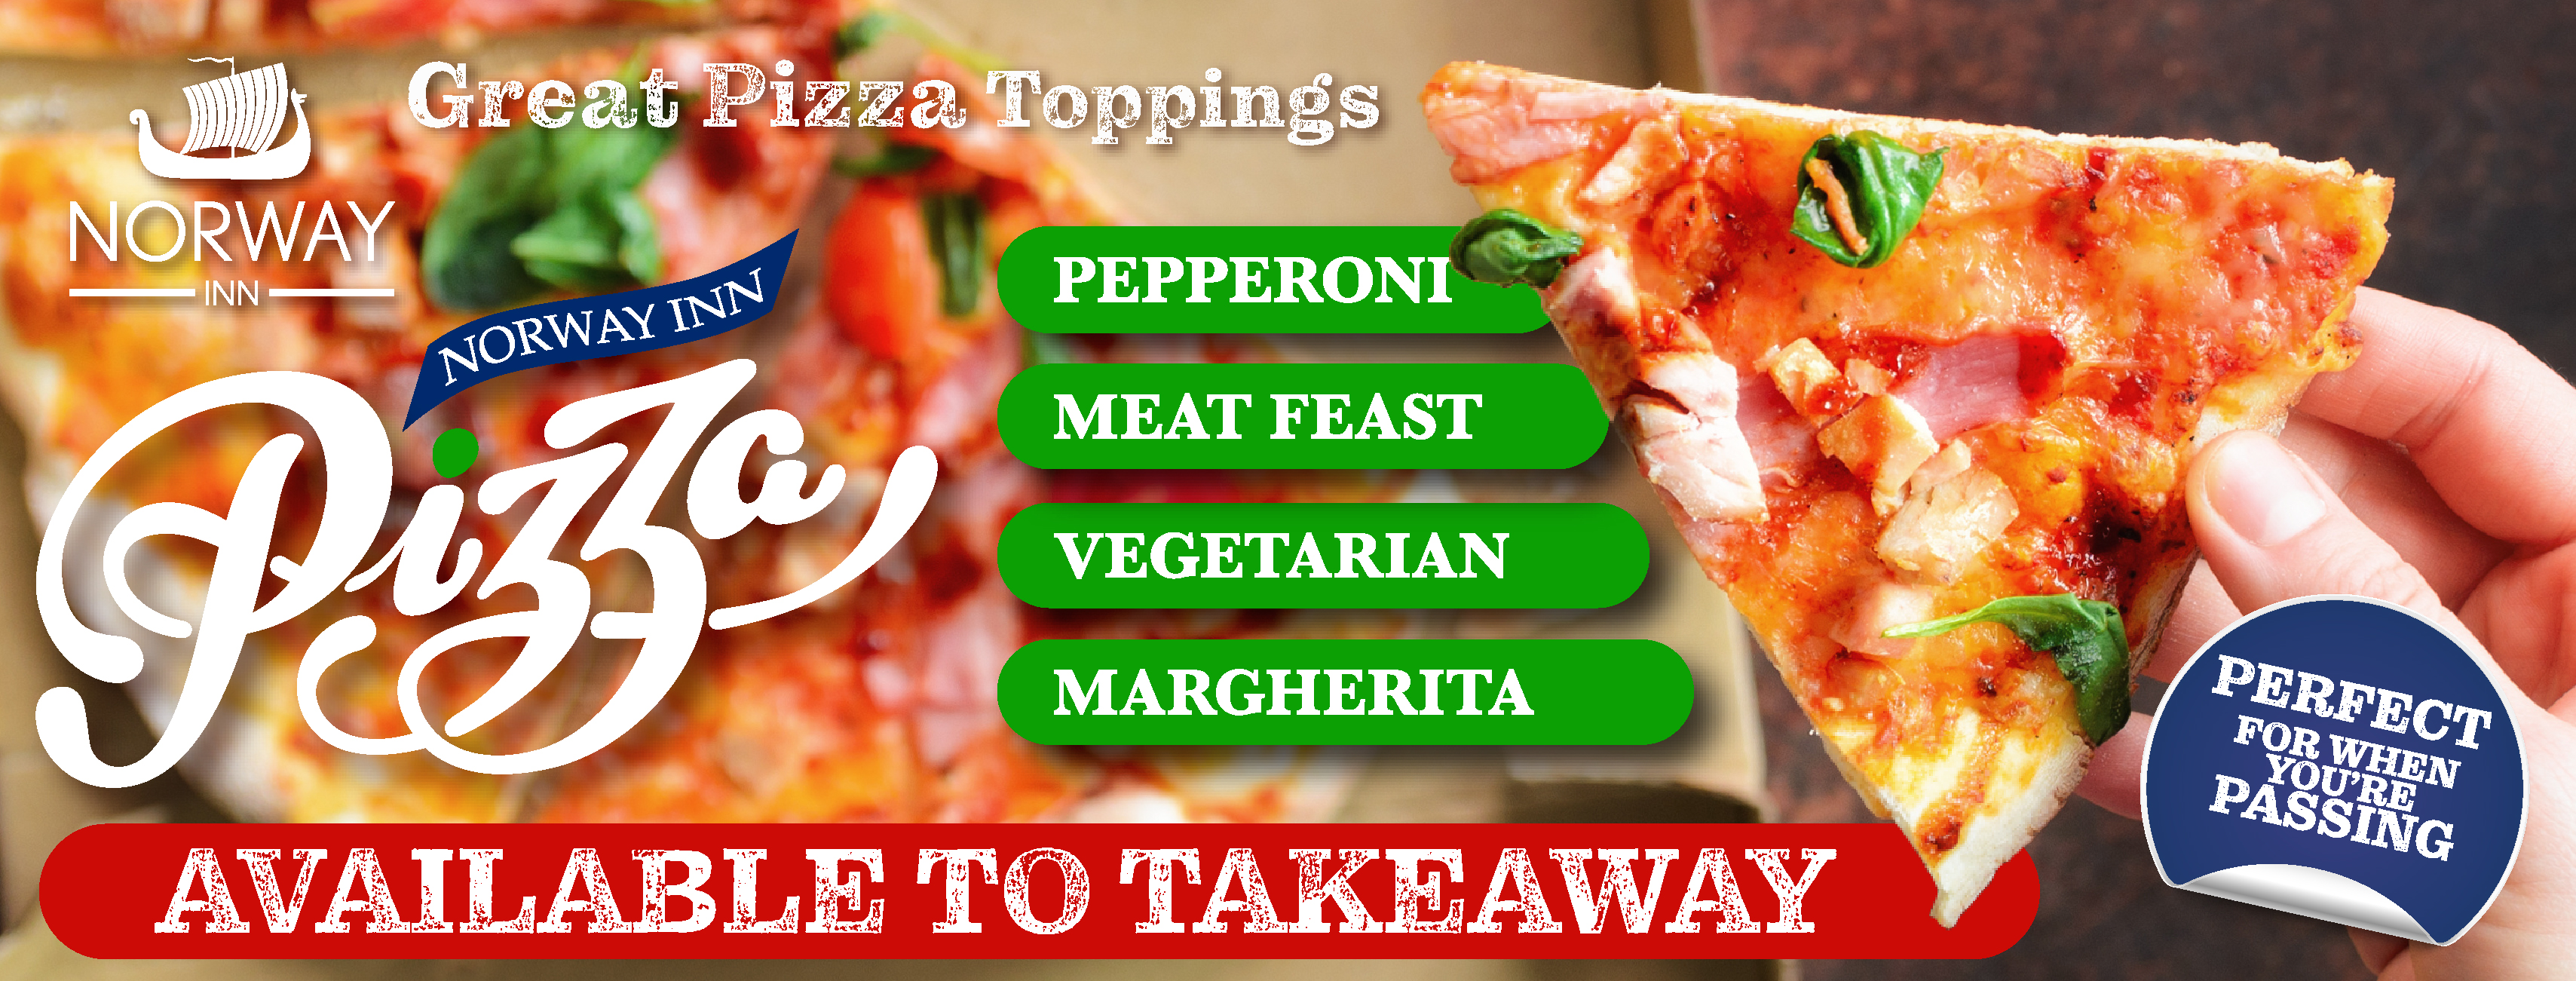 Pizza-facebook-cover-01